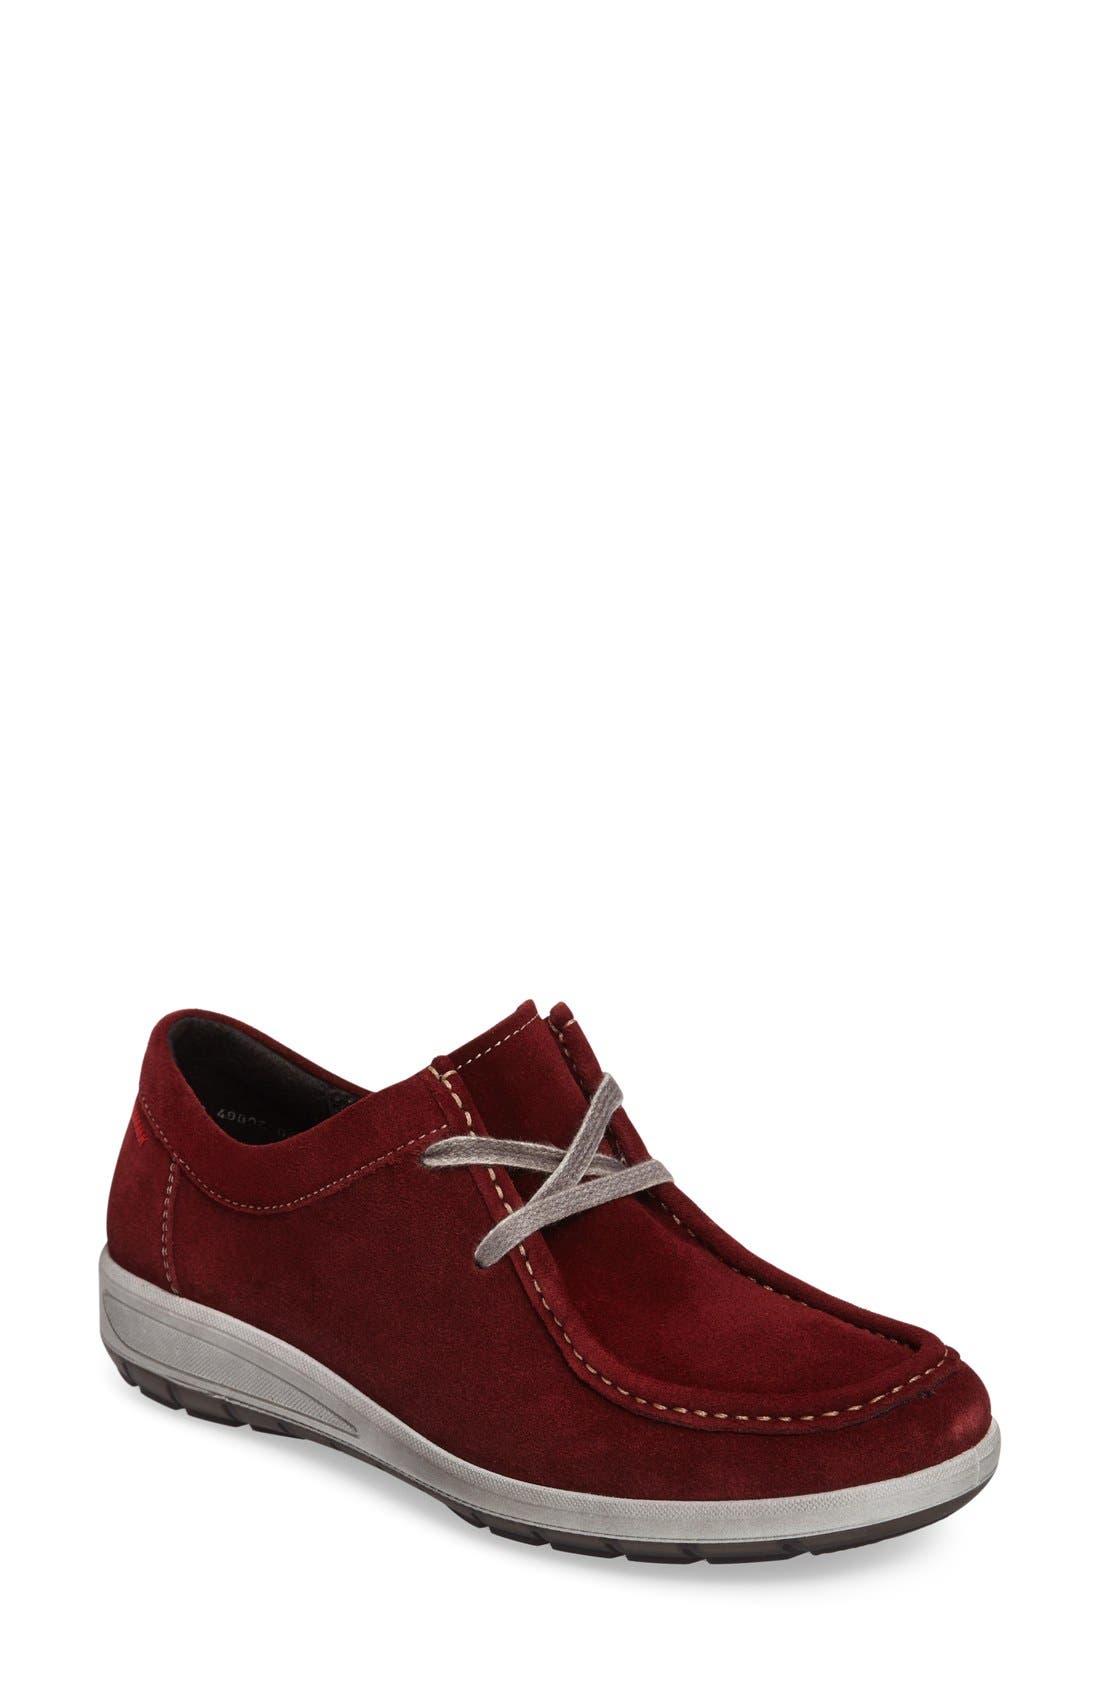 Trista Sneaker,                             Main thumbnail 1, color,                             Burgundy Suede